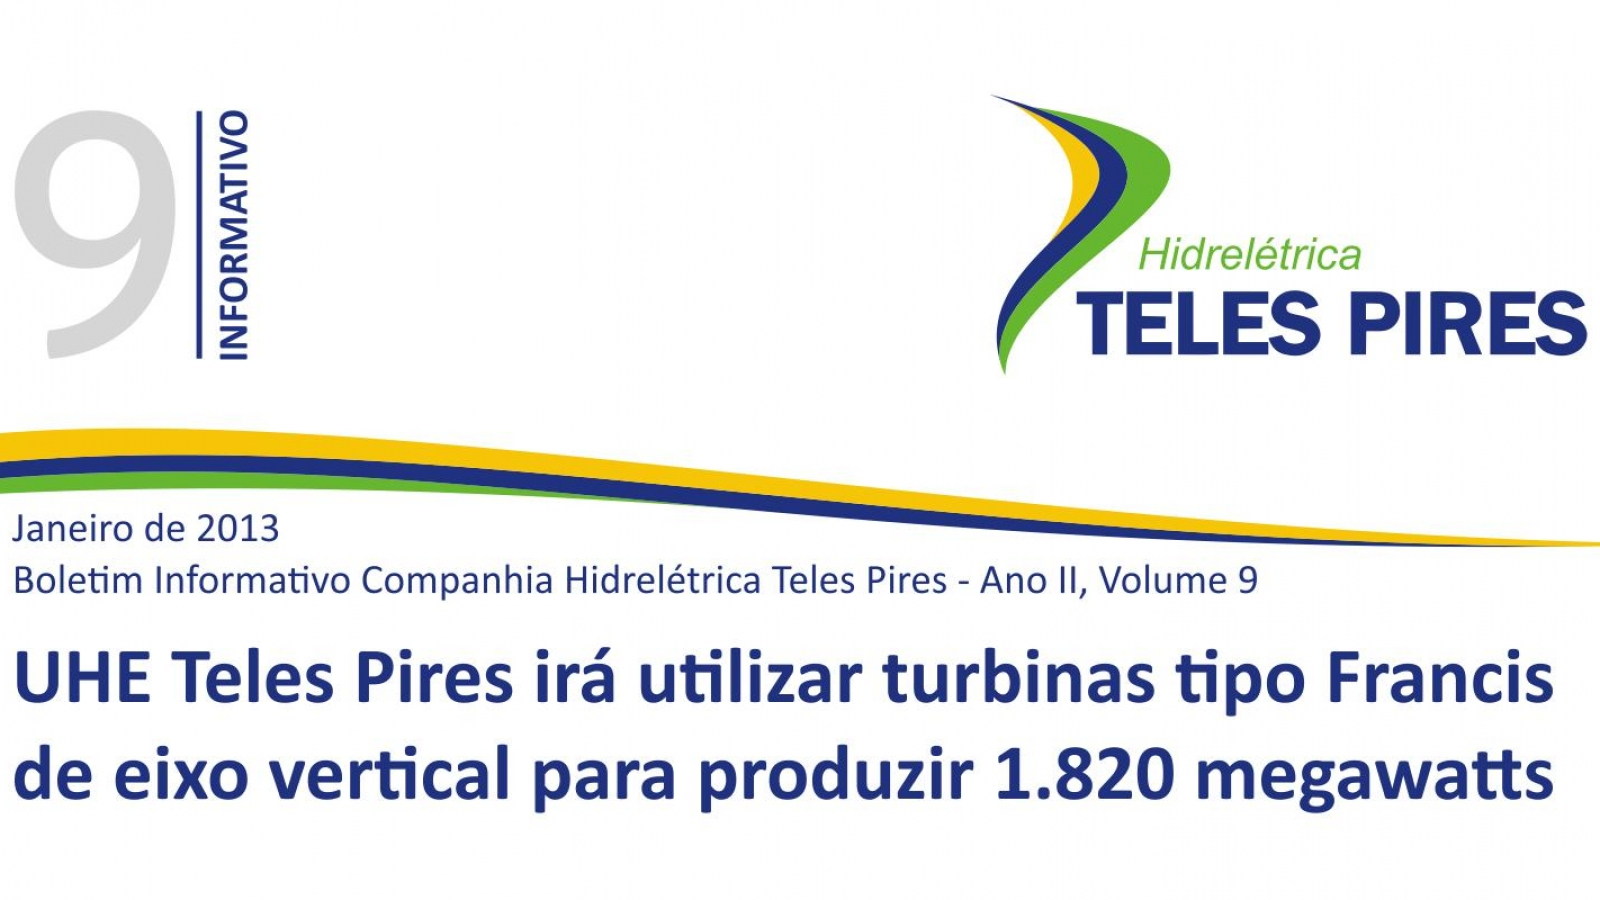 Boletim Informativo Companhia Hidrelétrica Teles Pires - Volume 9